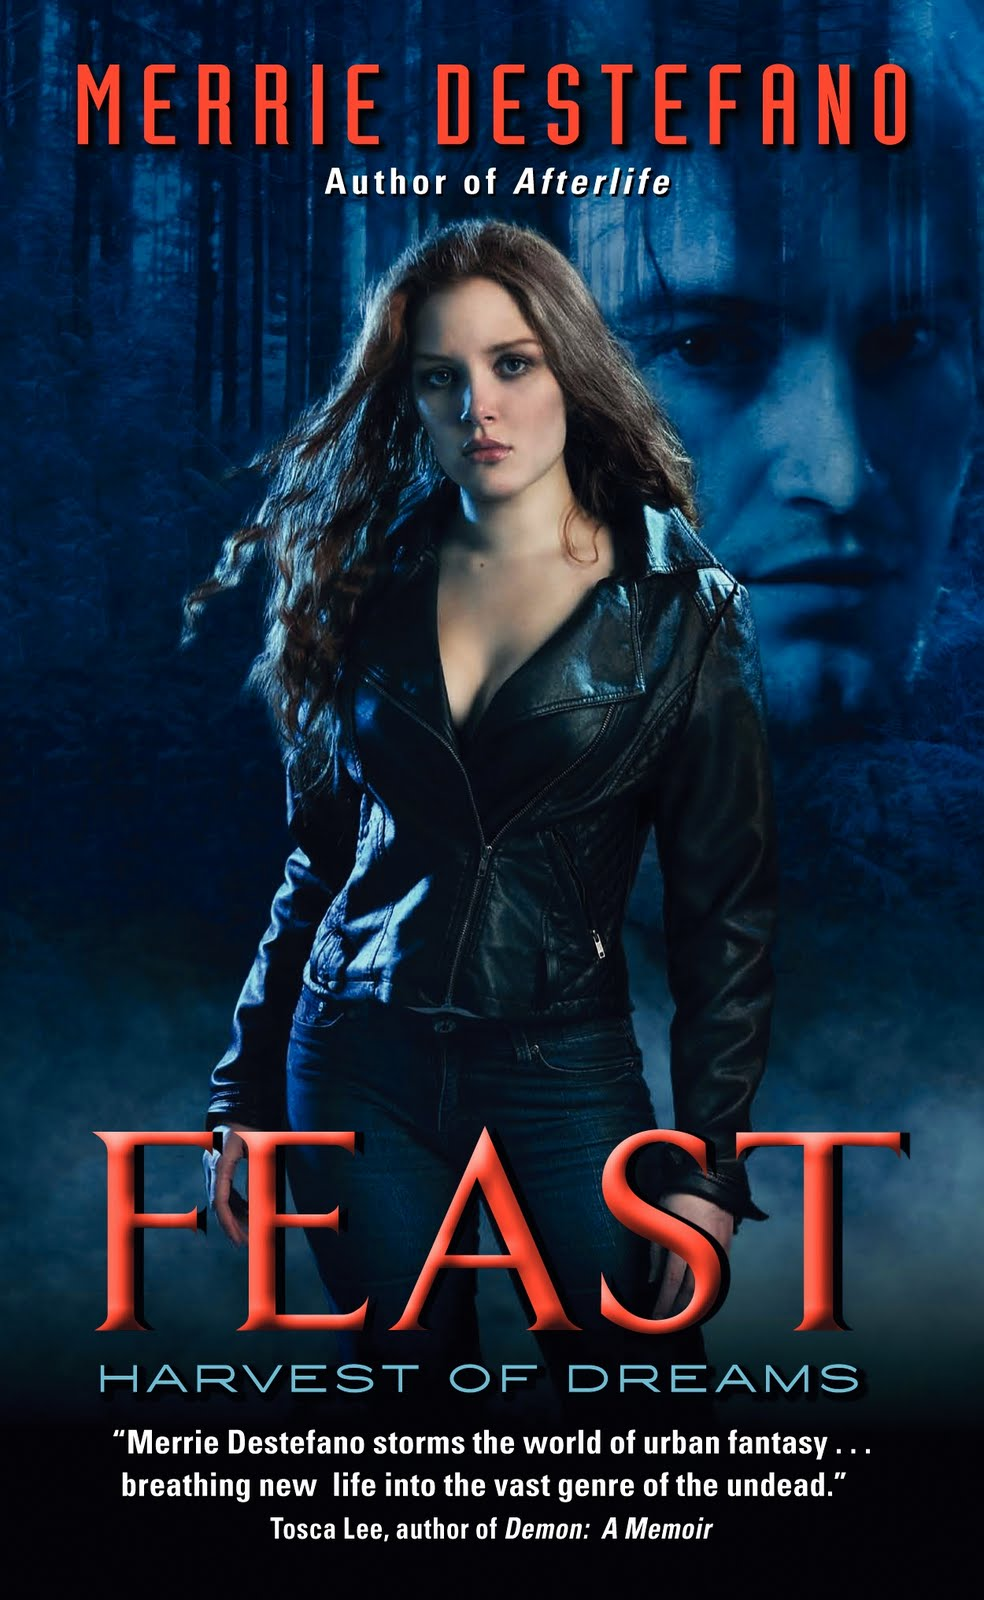 5bat! Review: Feast by Merrie Destefano